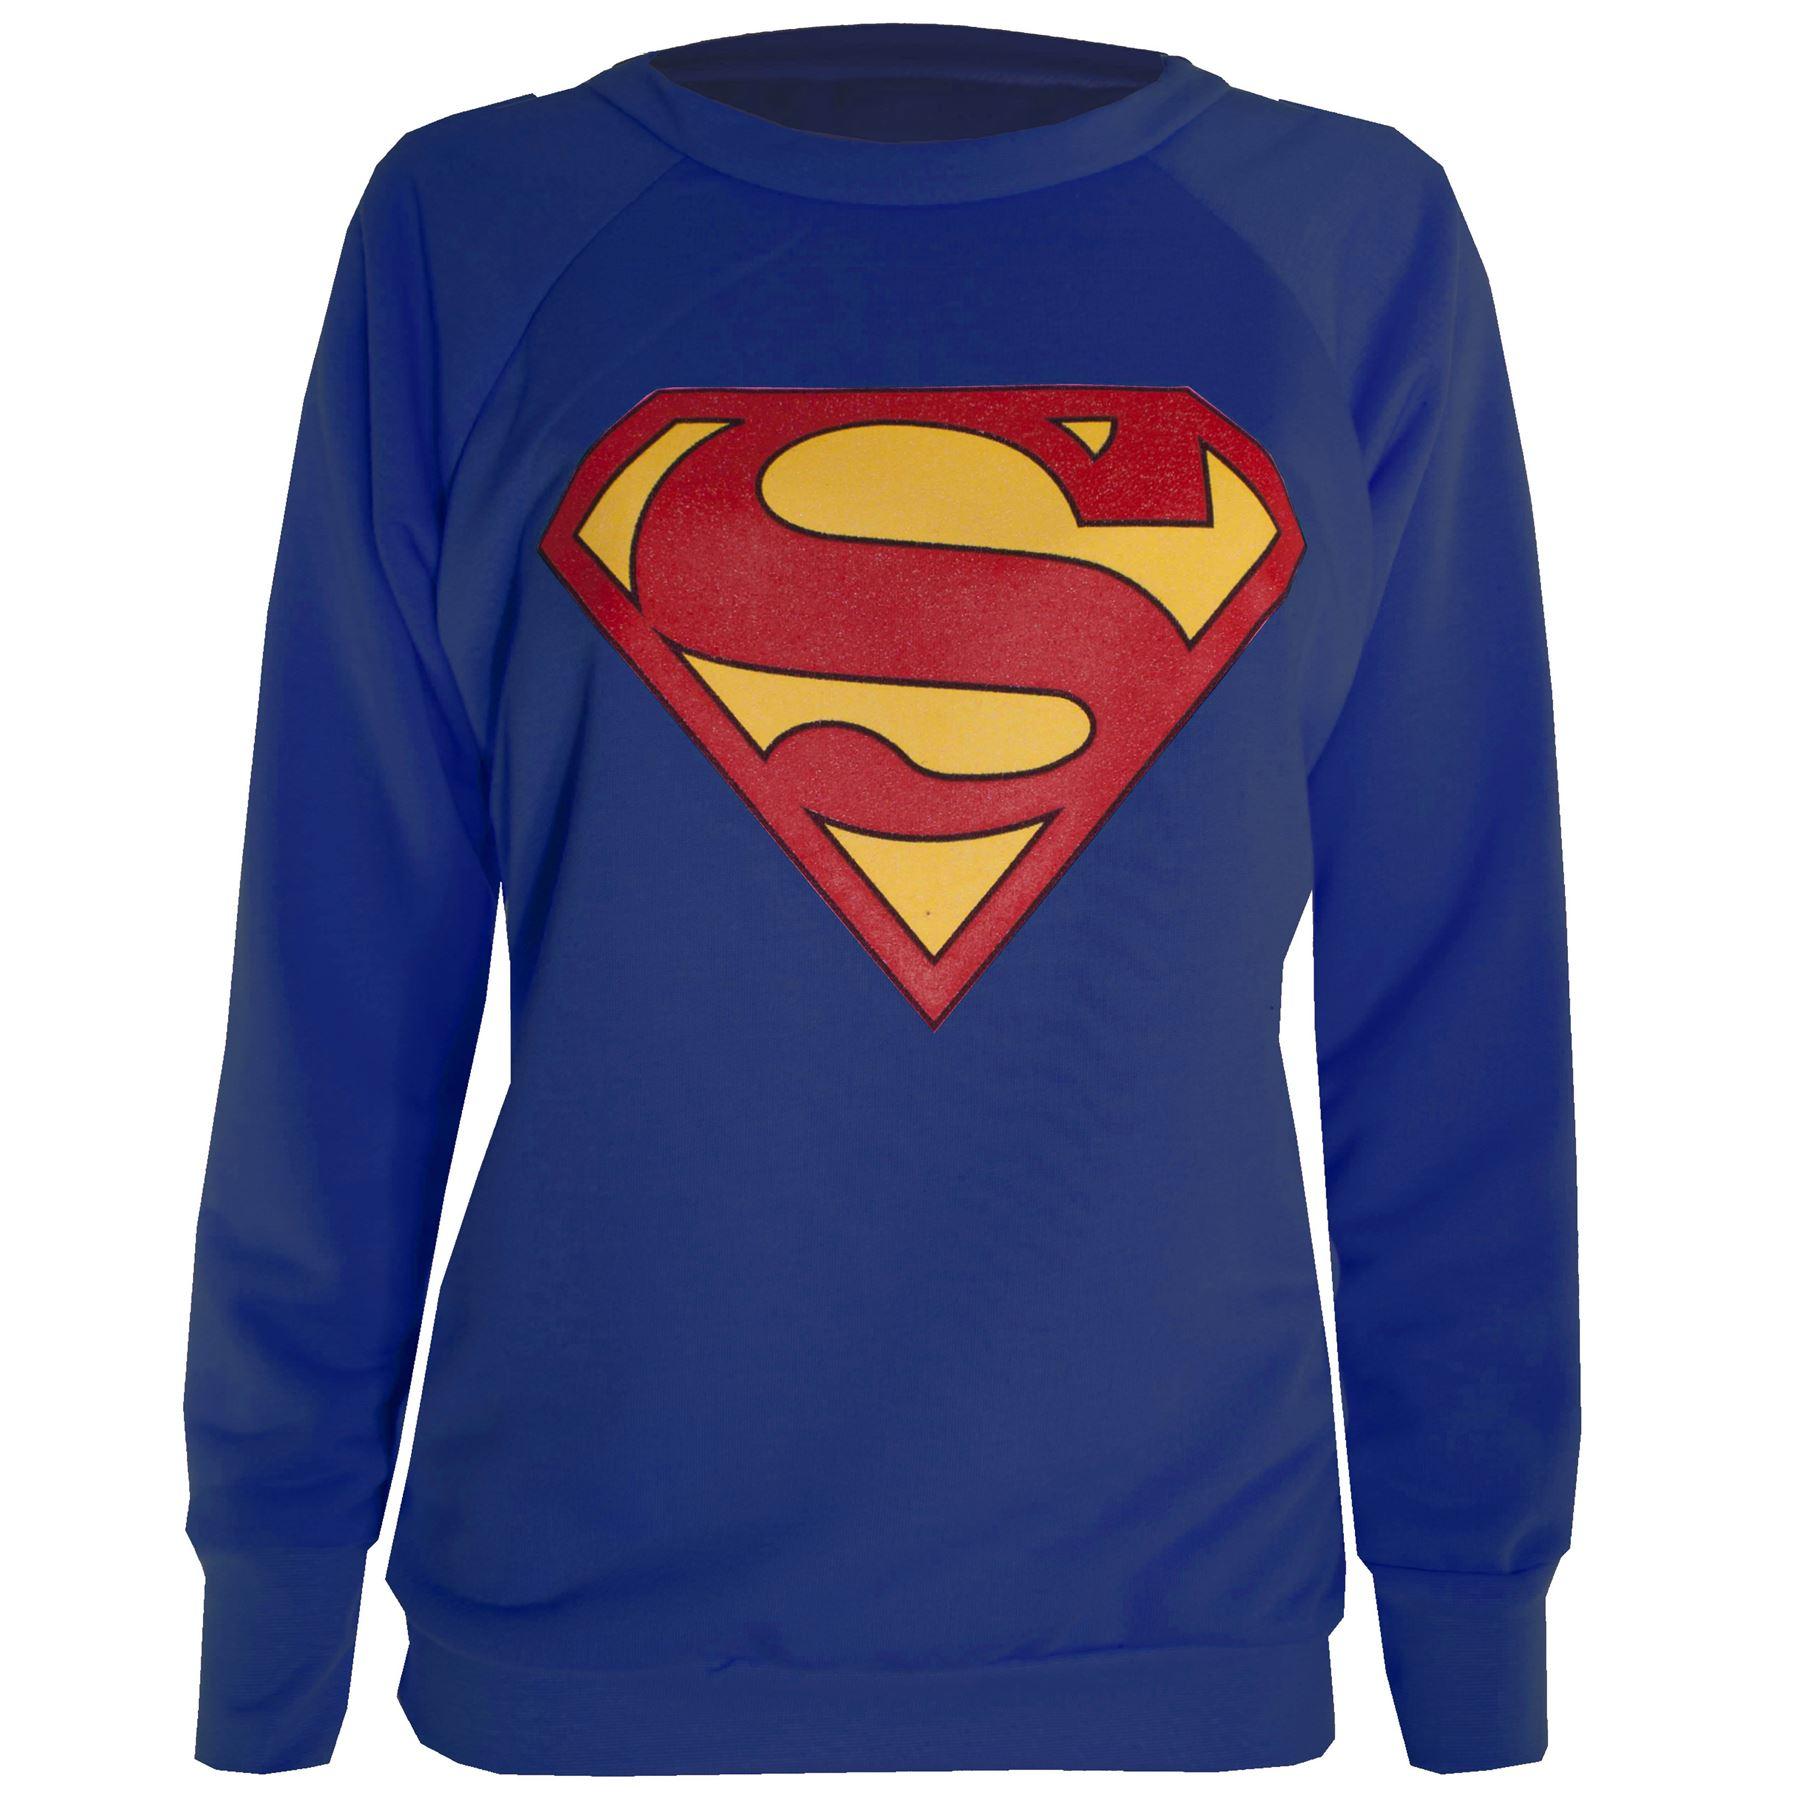 femmes manches longues superman t shirt femmes batman. Black Bedroom Furniture Sets. Home Design Ideas